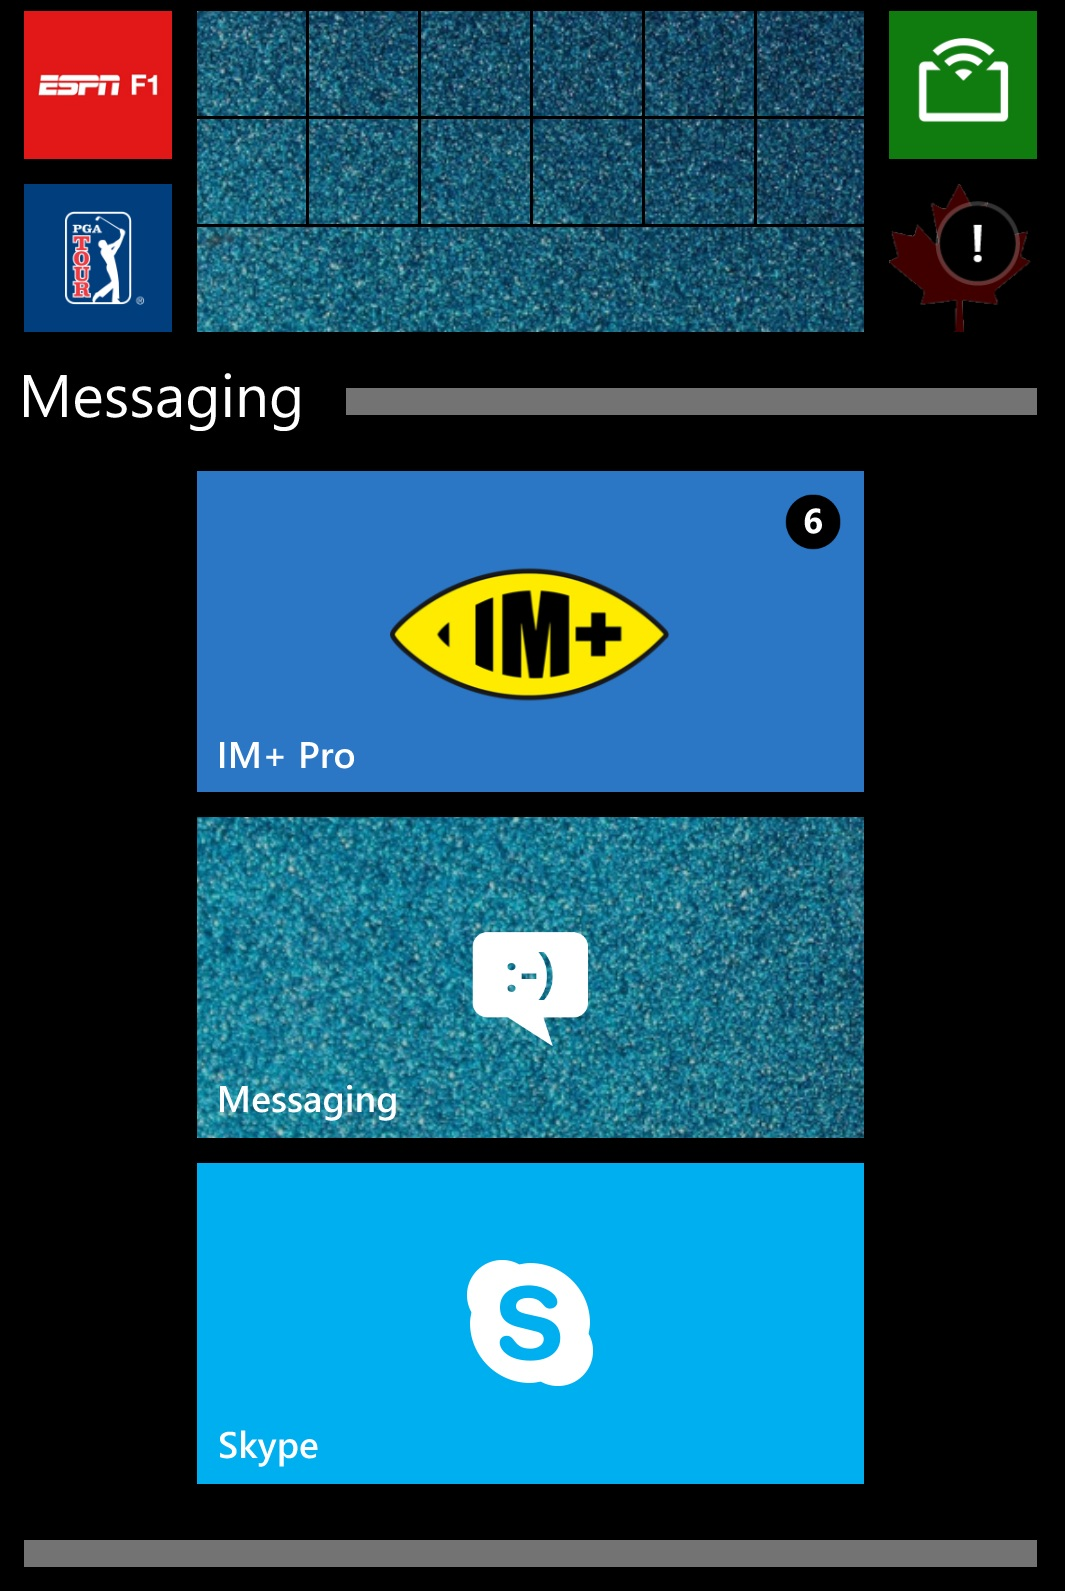 Software and Windows Phone 8 1 GDR1 - Nokia Lumia 930 Review